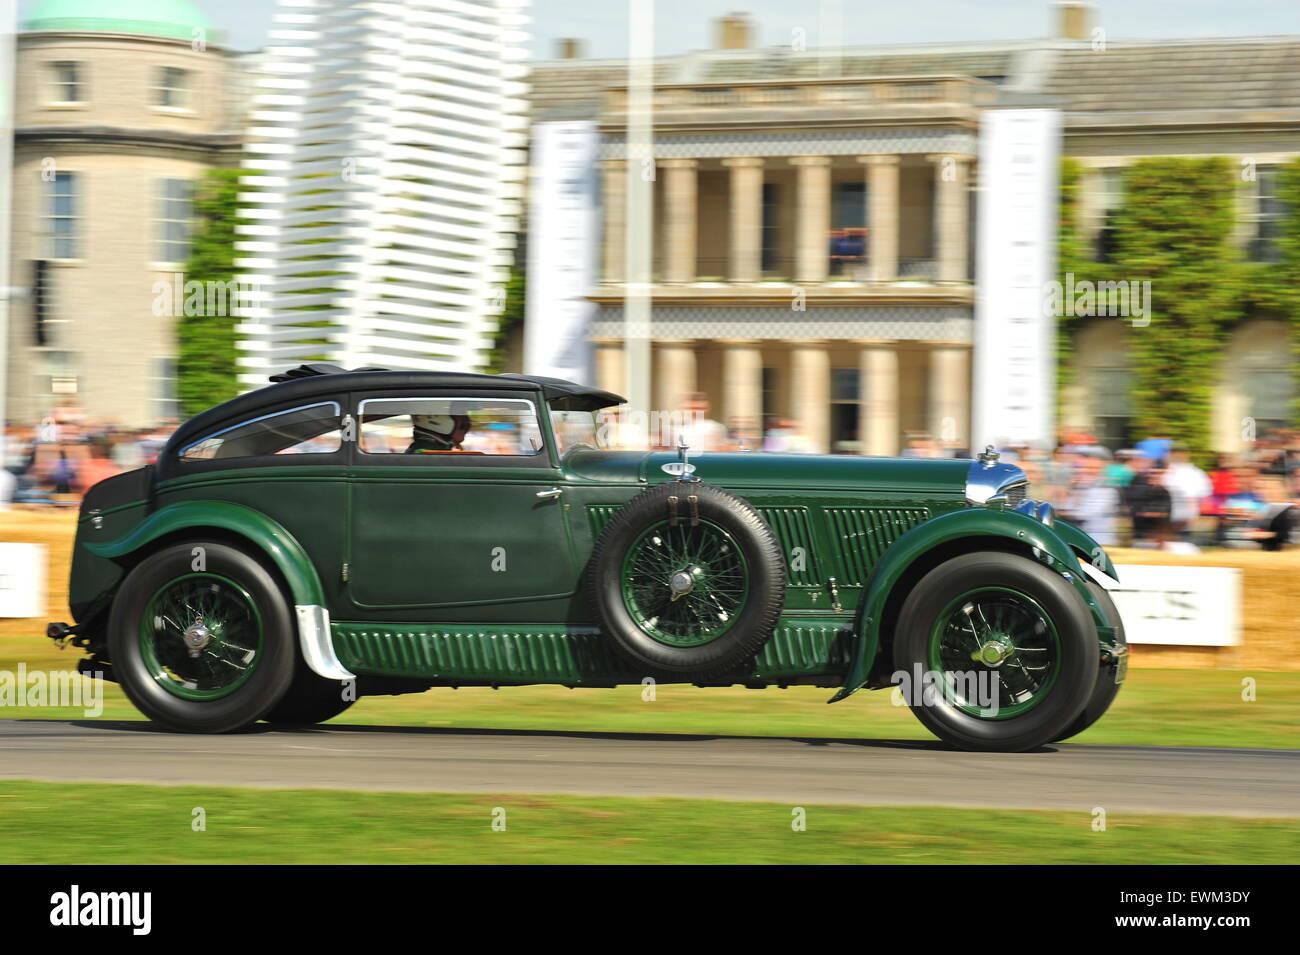 Bentley Speed Six Stock Photos & Bentley Speed Six Stock Images - Alamy